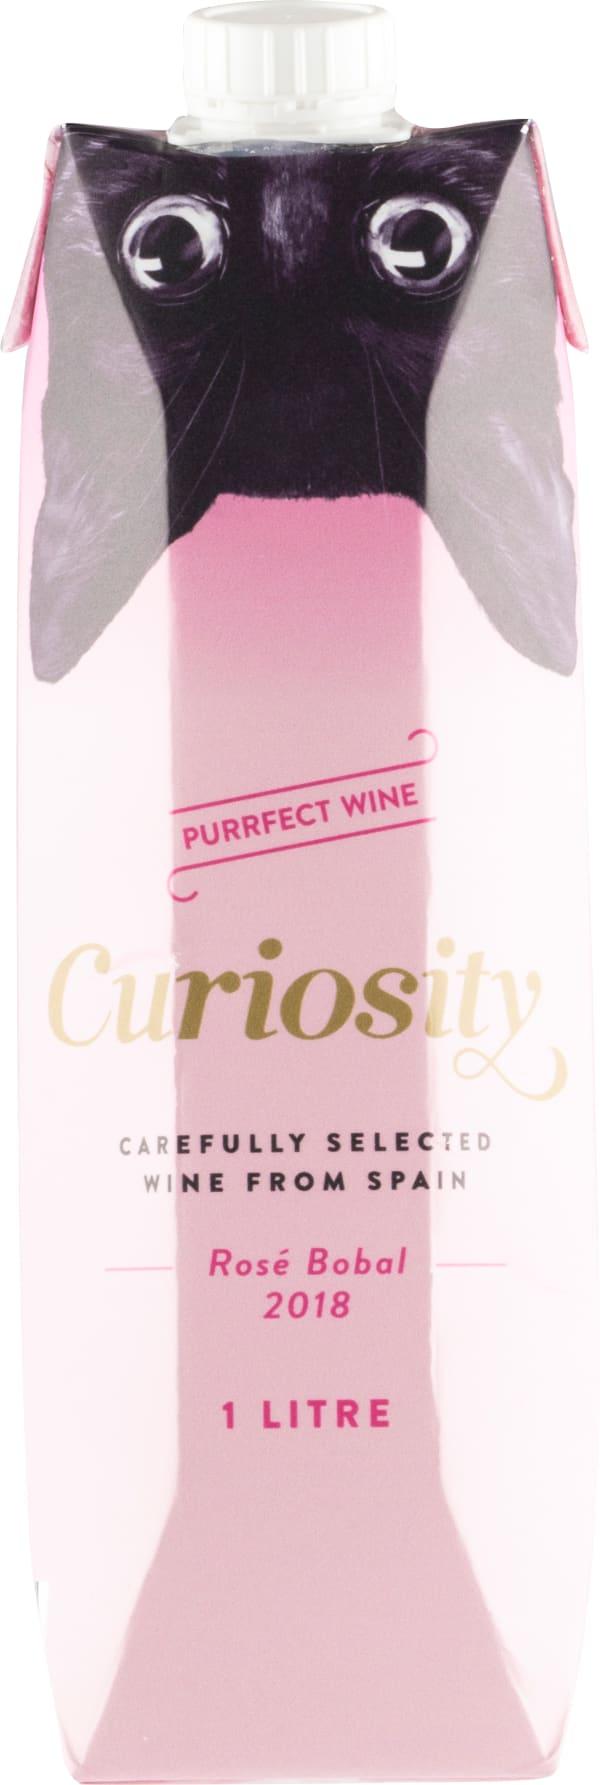 Curiosity Rosé Bobal 2018 carton package